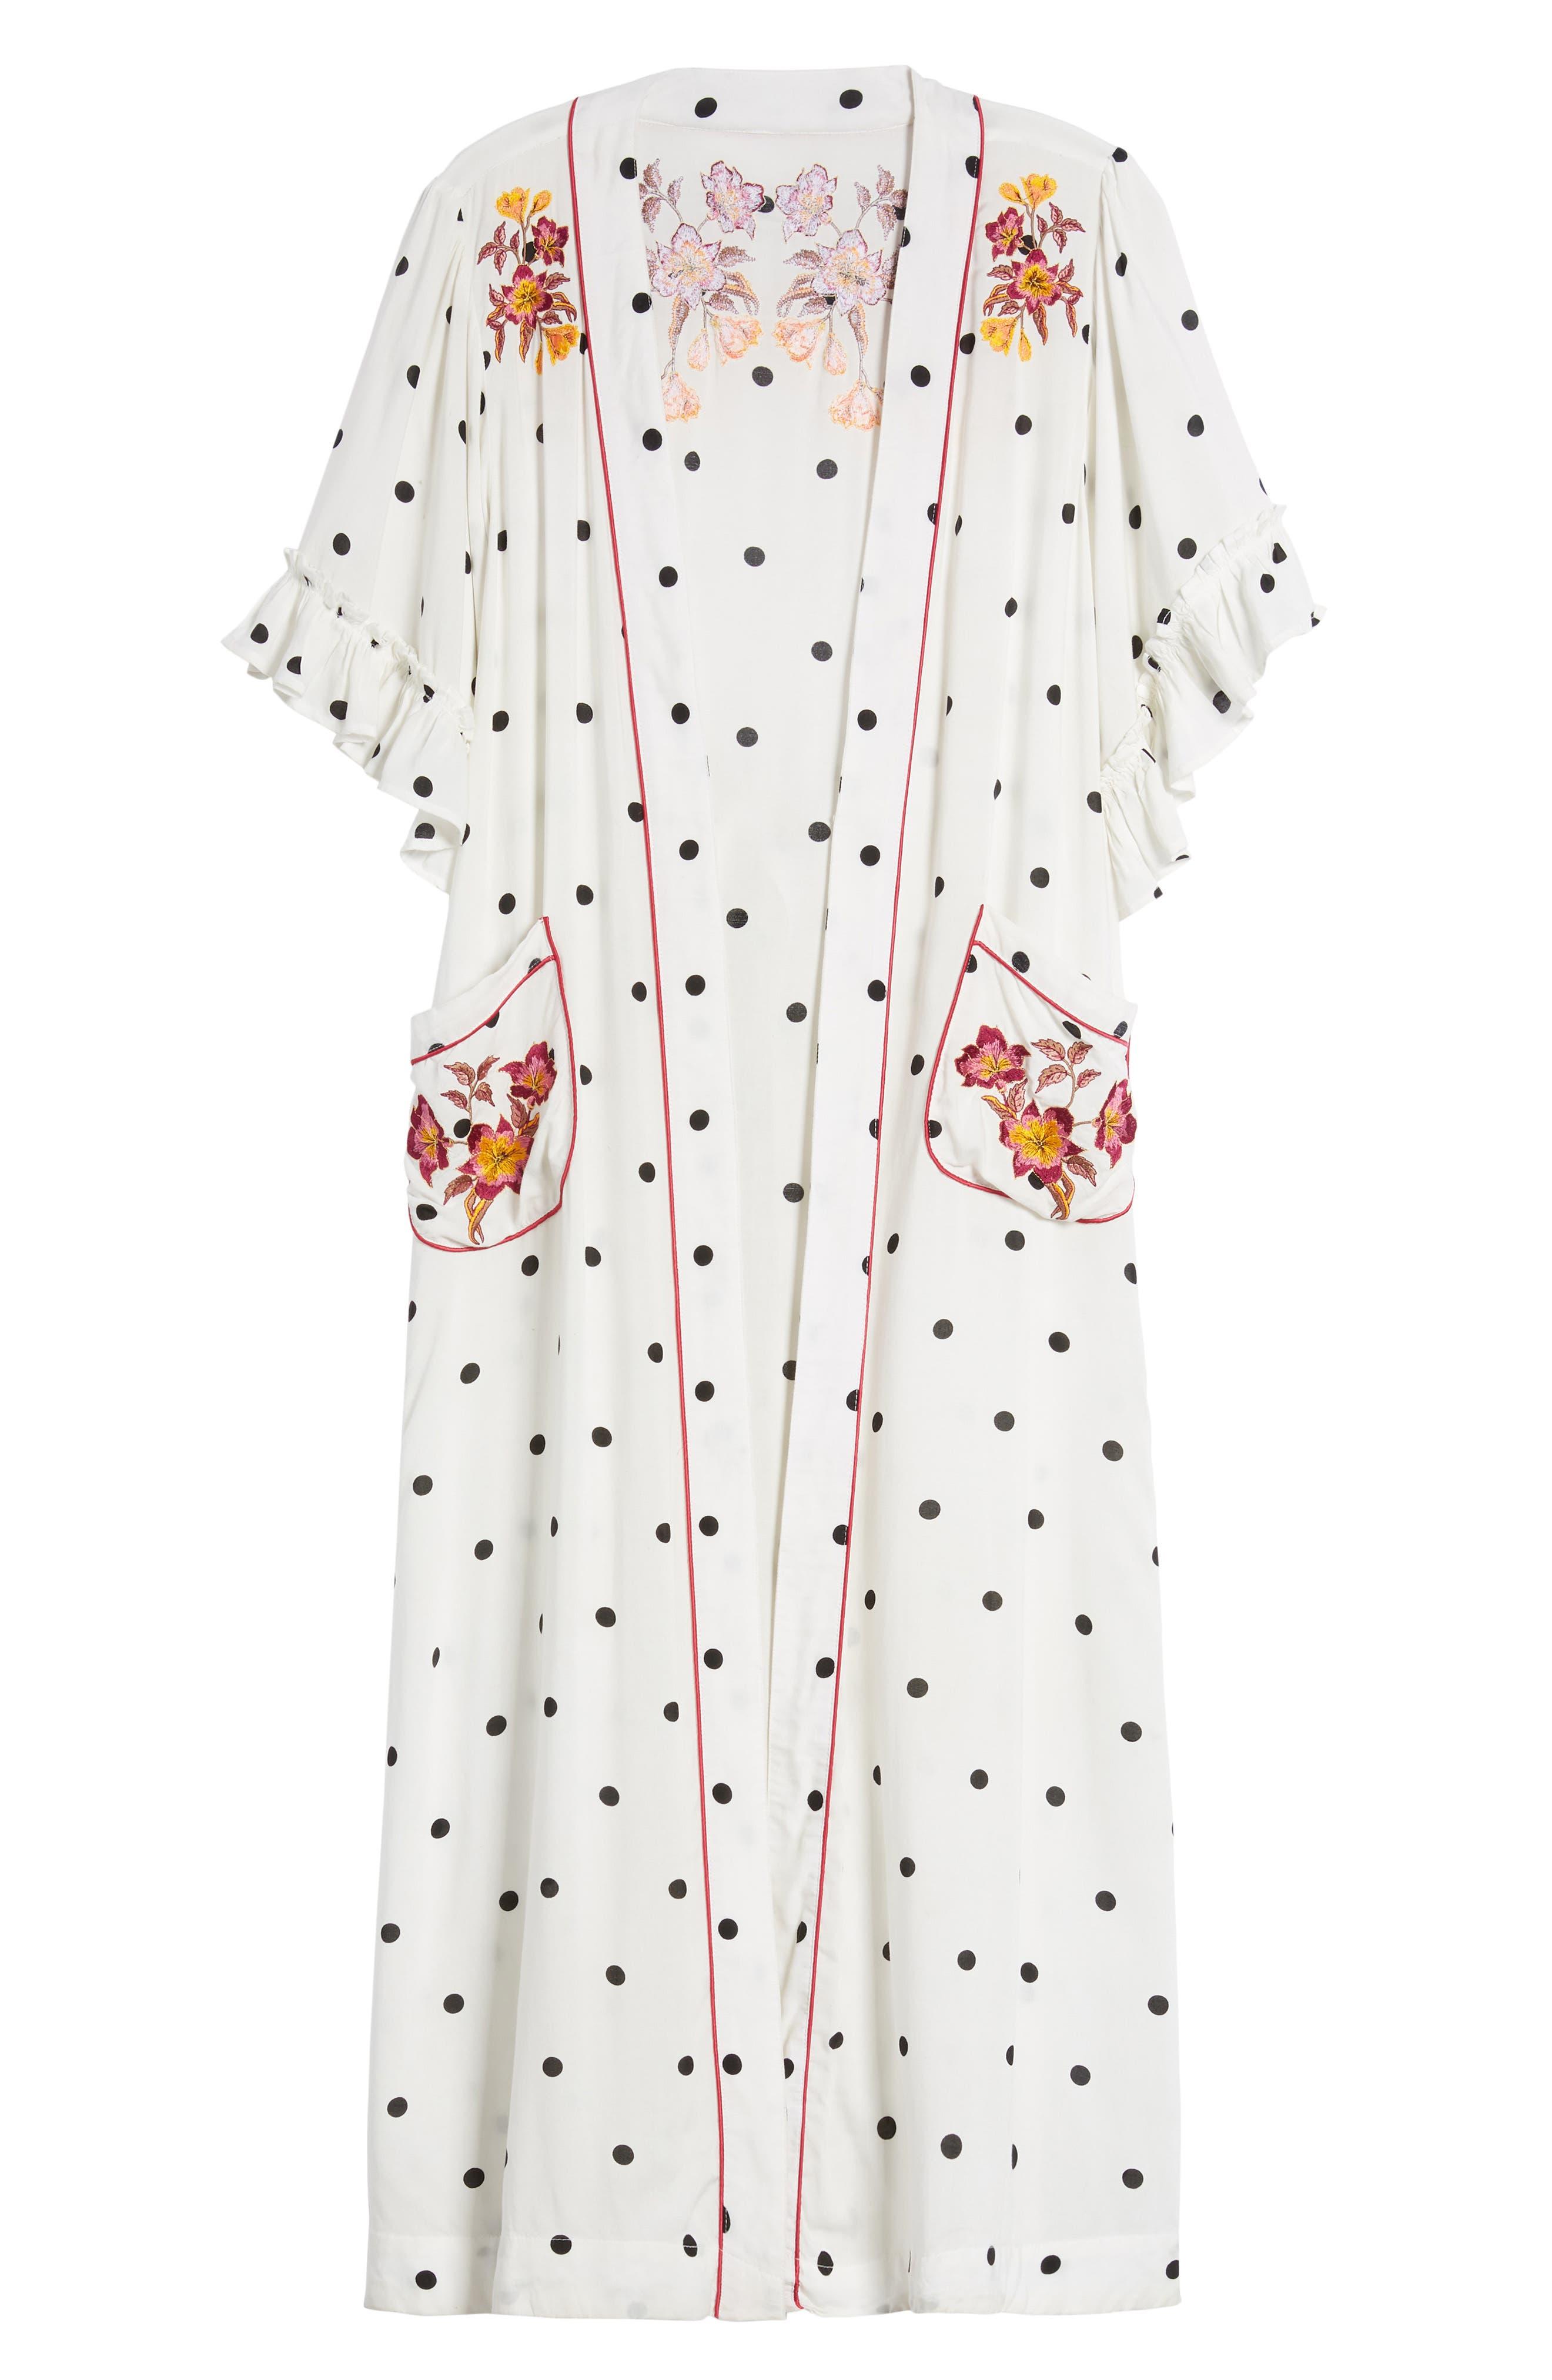 Hot Spot Kimono,                             Alternate thumbnail 6, color,                             Black/ White Polka Dot Print